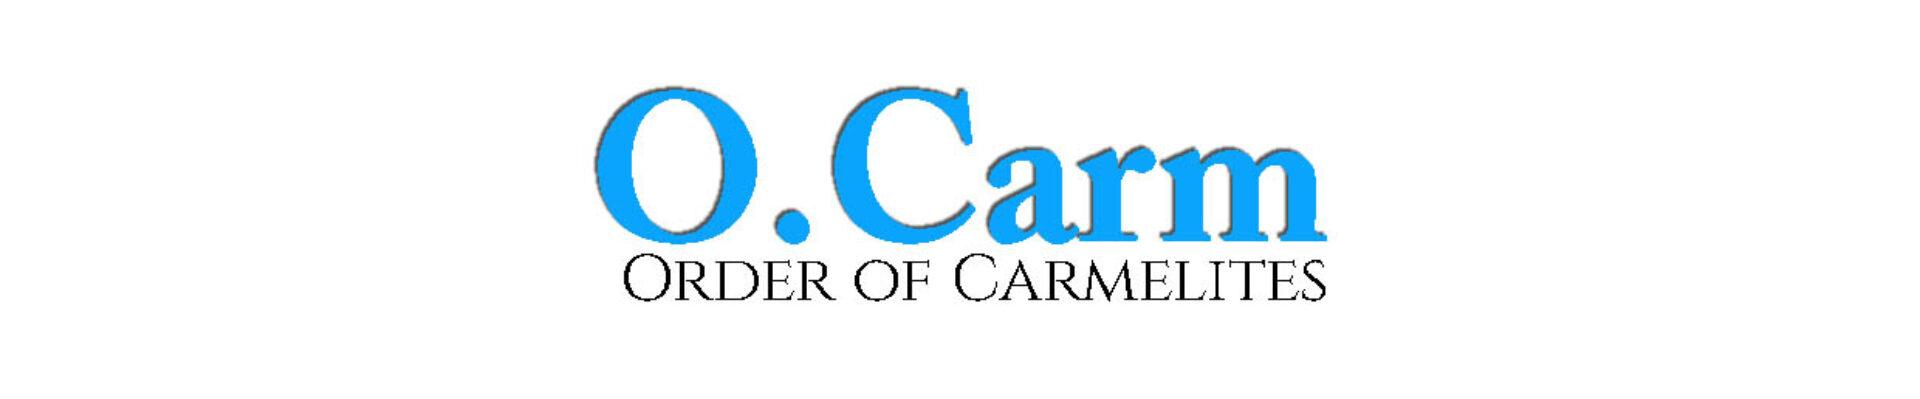 O.Carm